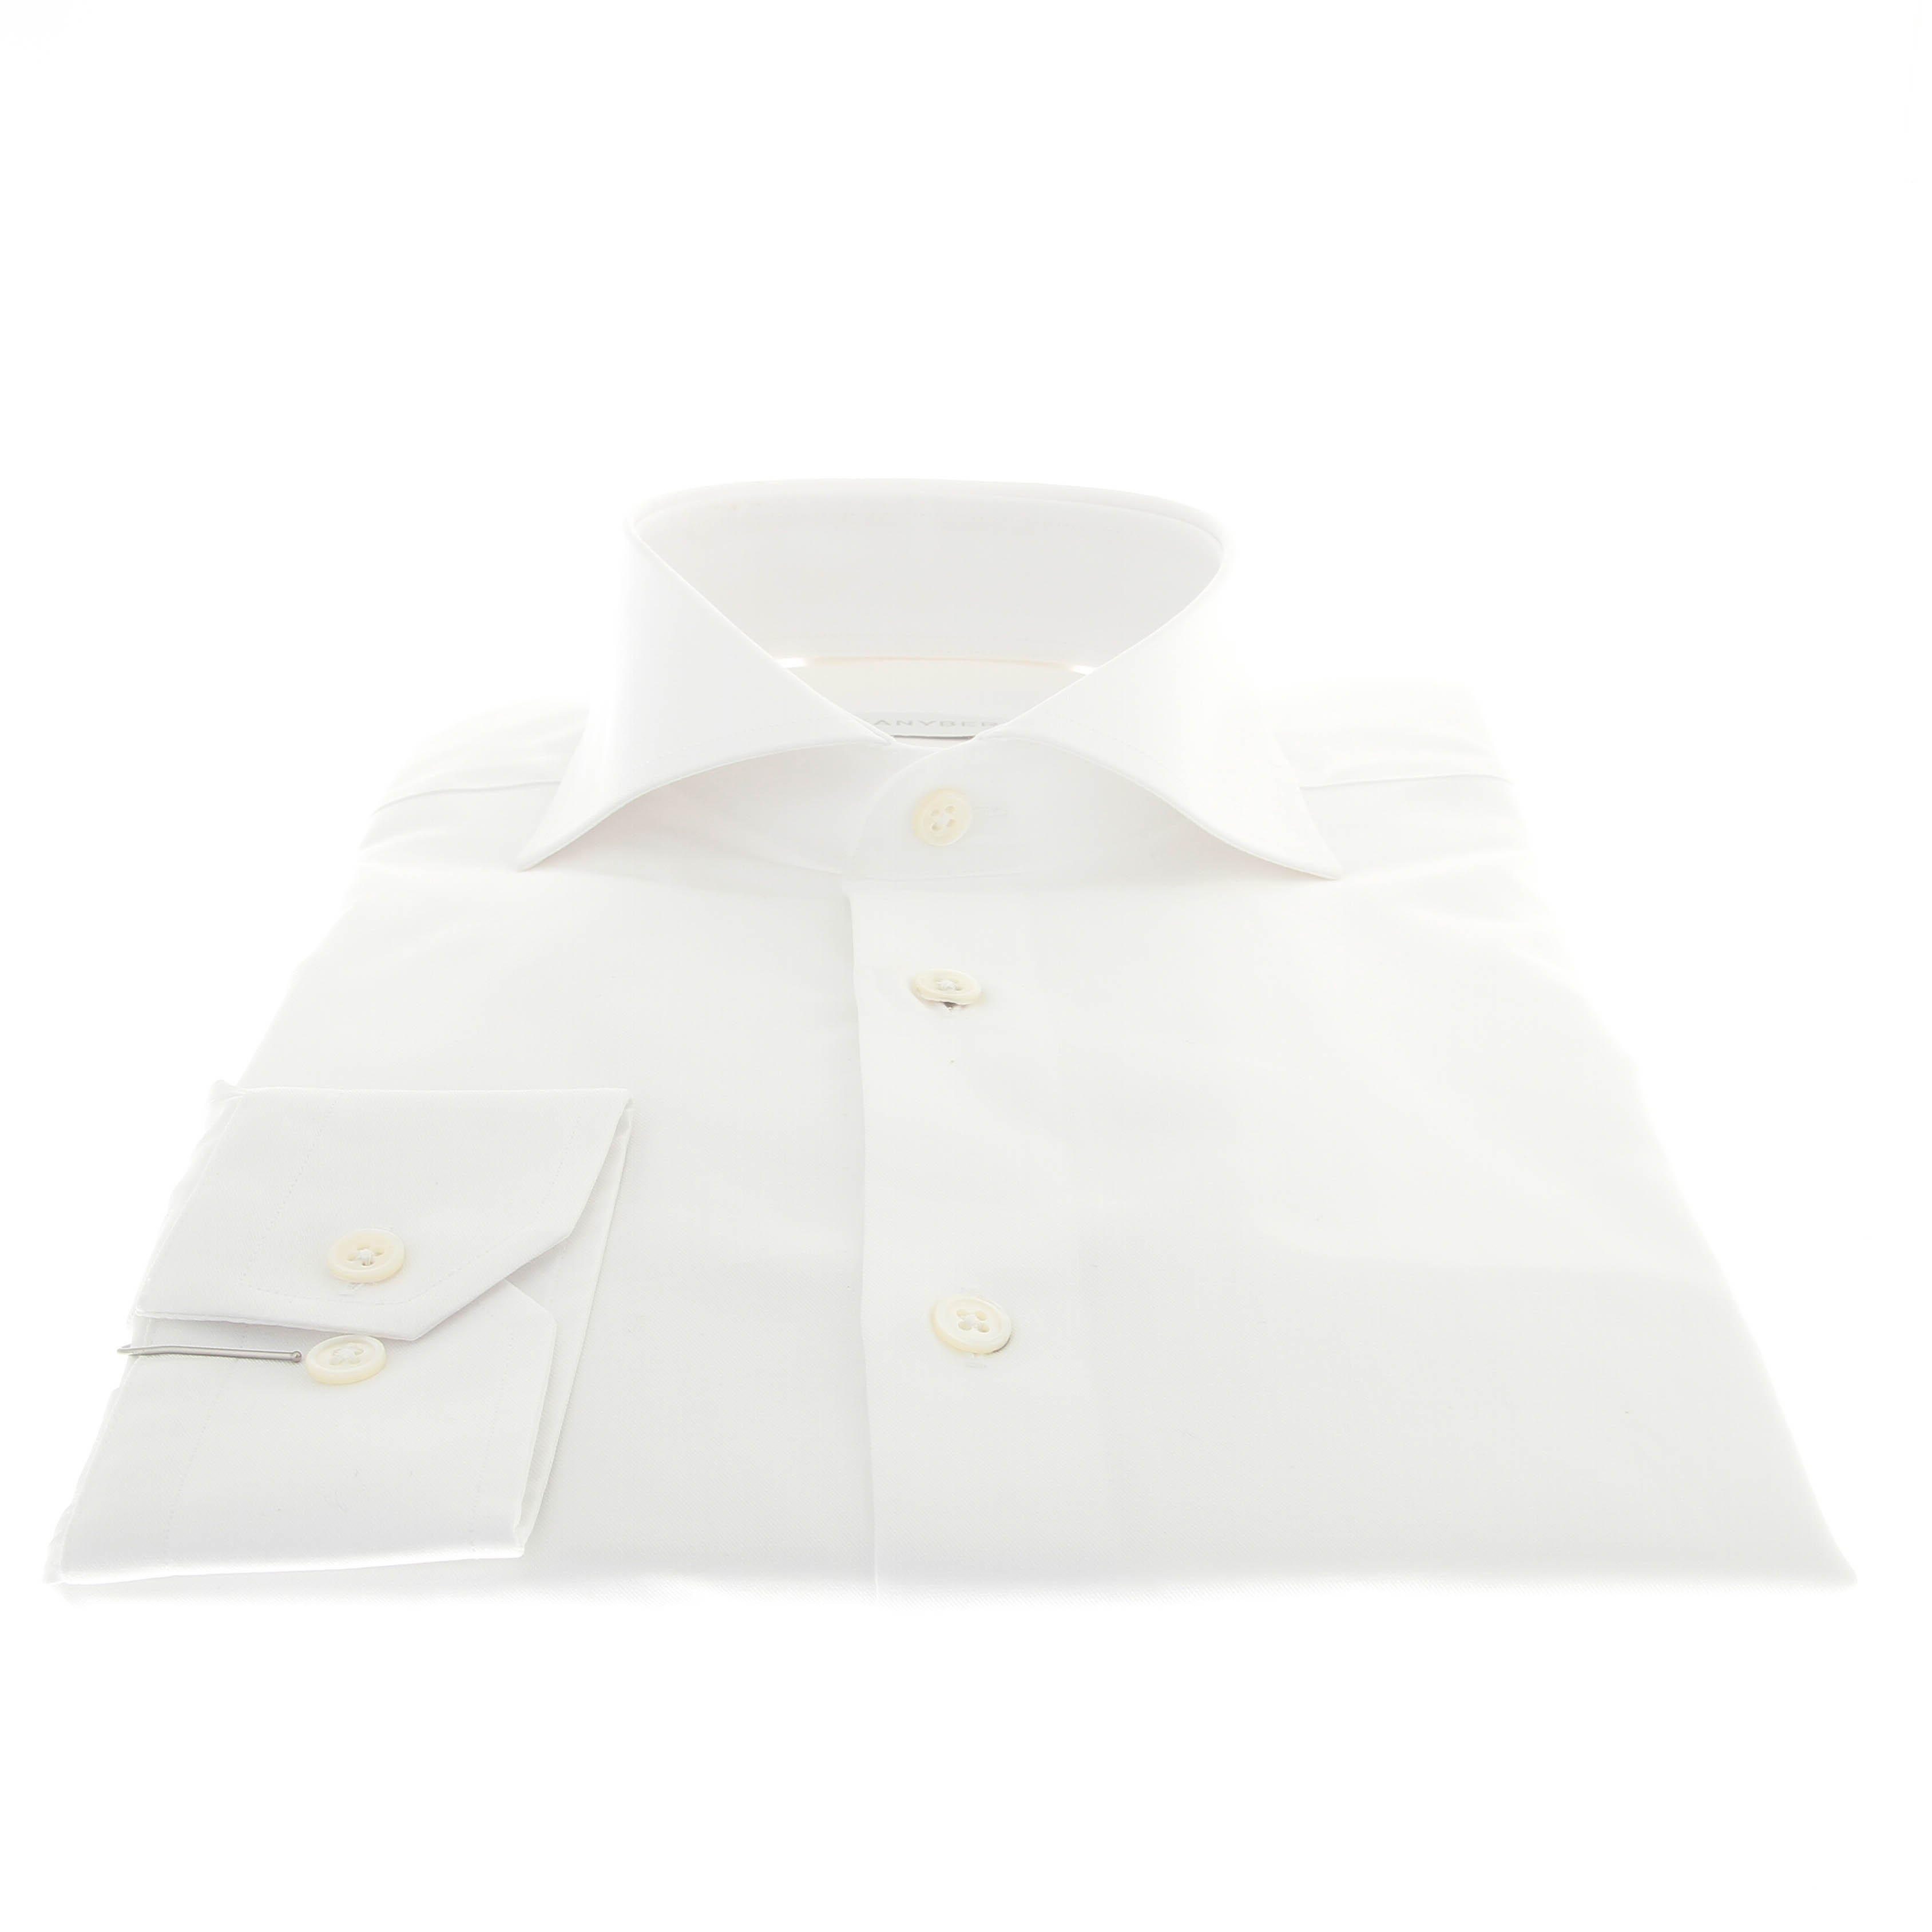 Chemise Perla : Blanc - Col Italien - Boutons en nacre. (Shirts)